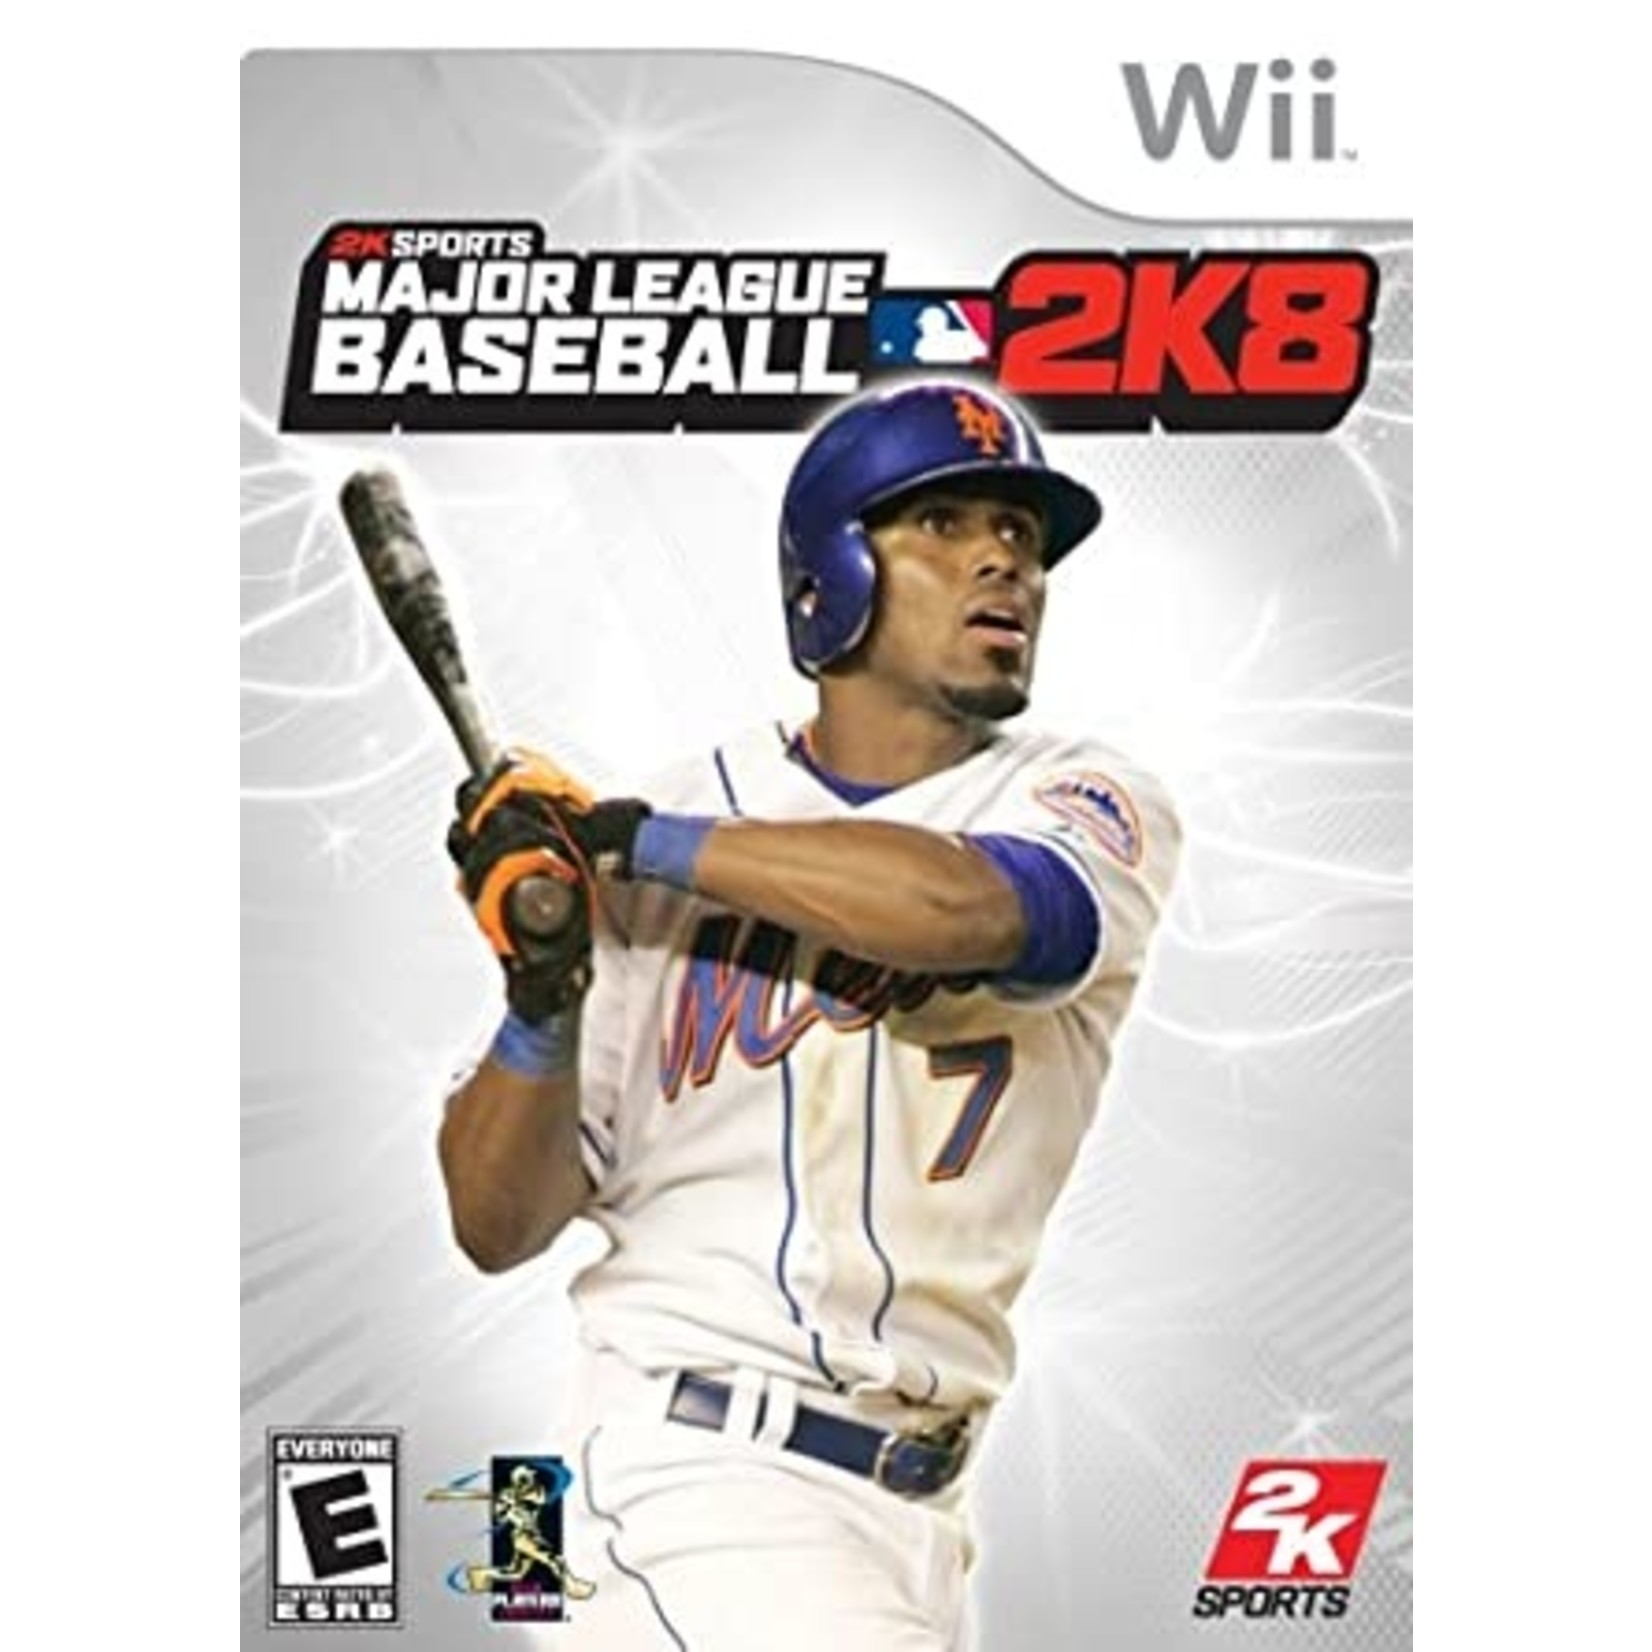 WIIUSD-MLB 2K8